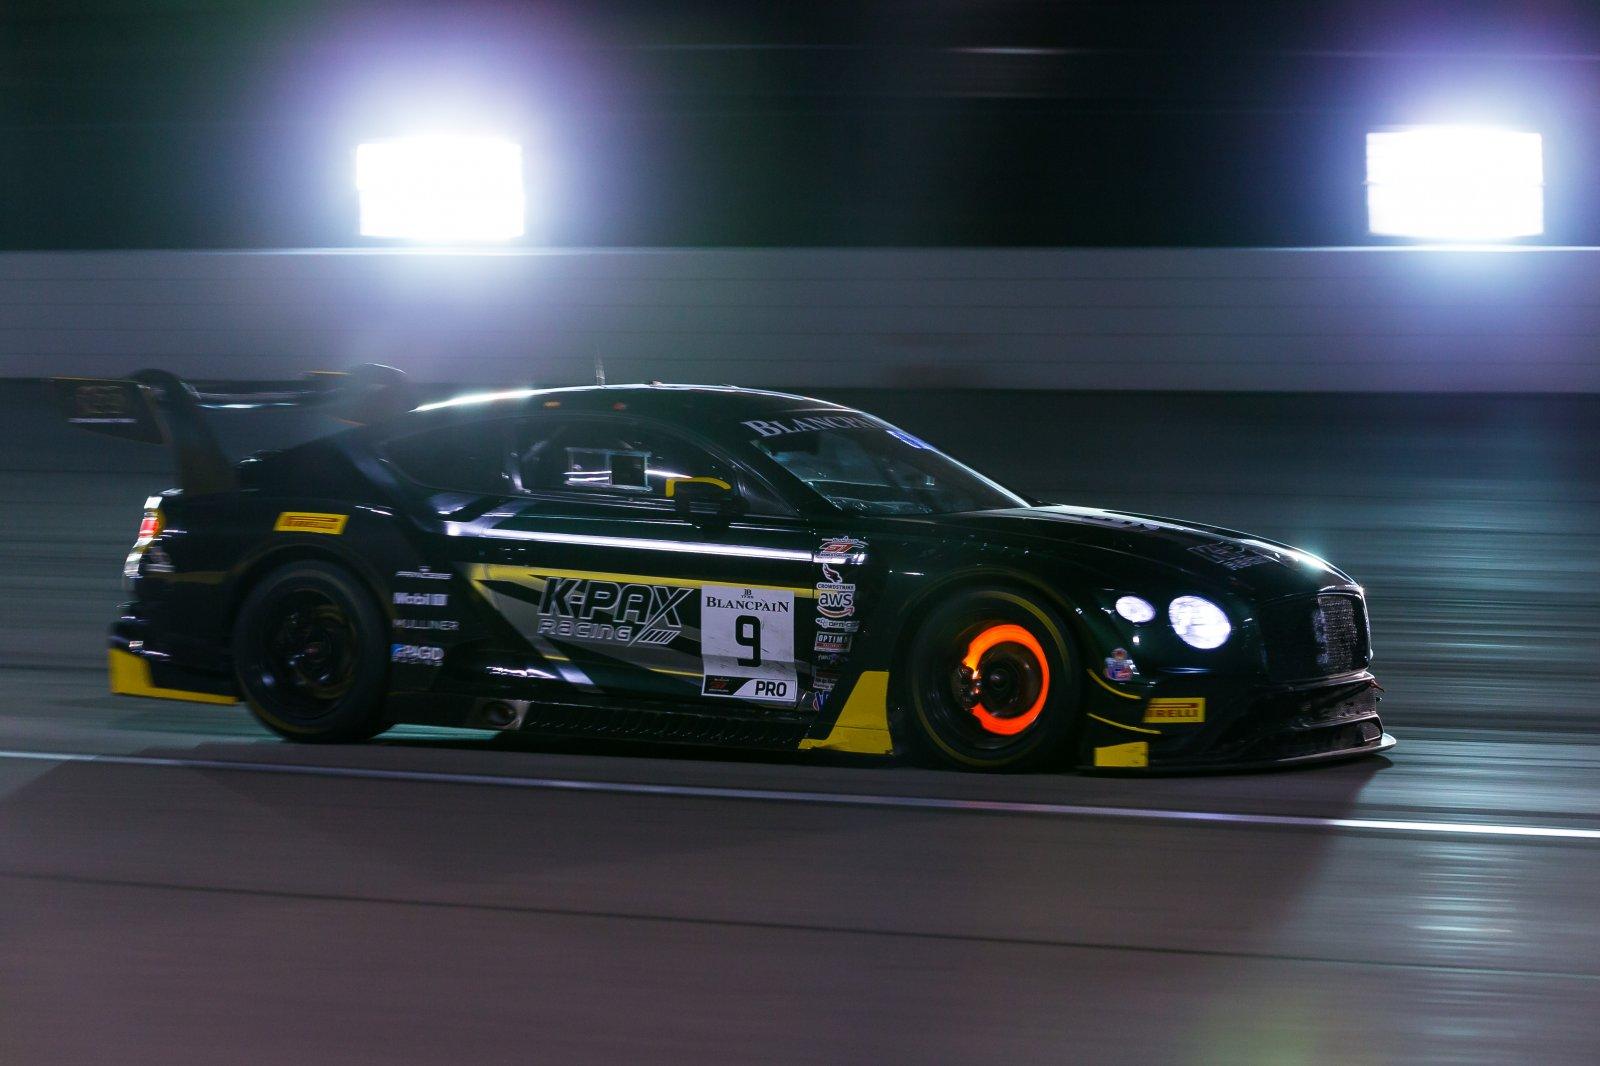 #9 Bentley Continental GT3 of Alvaro Parente and Andy Soucek with K-PAX Racing2019 Blancpain GT World Challenge America - Las Vegas, Las Vegas NV